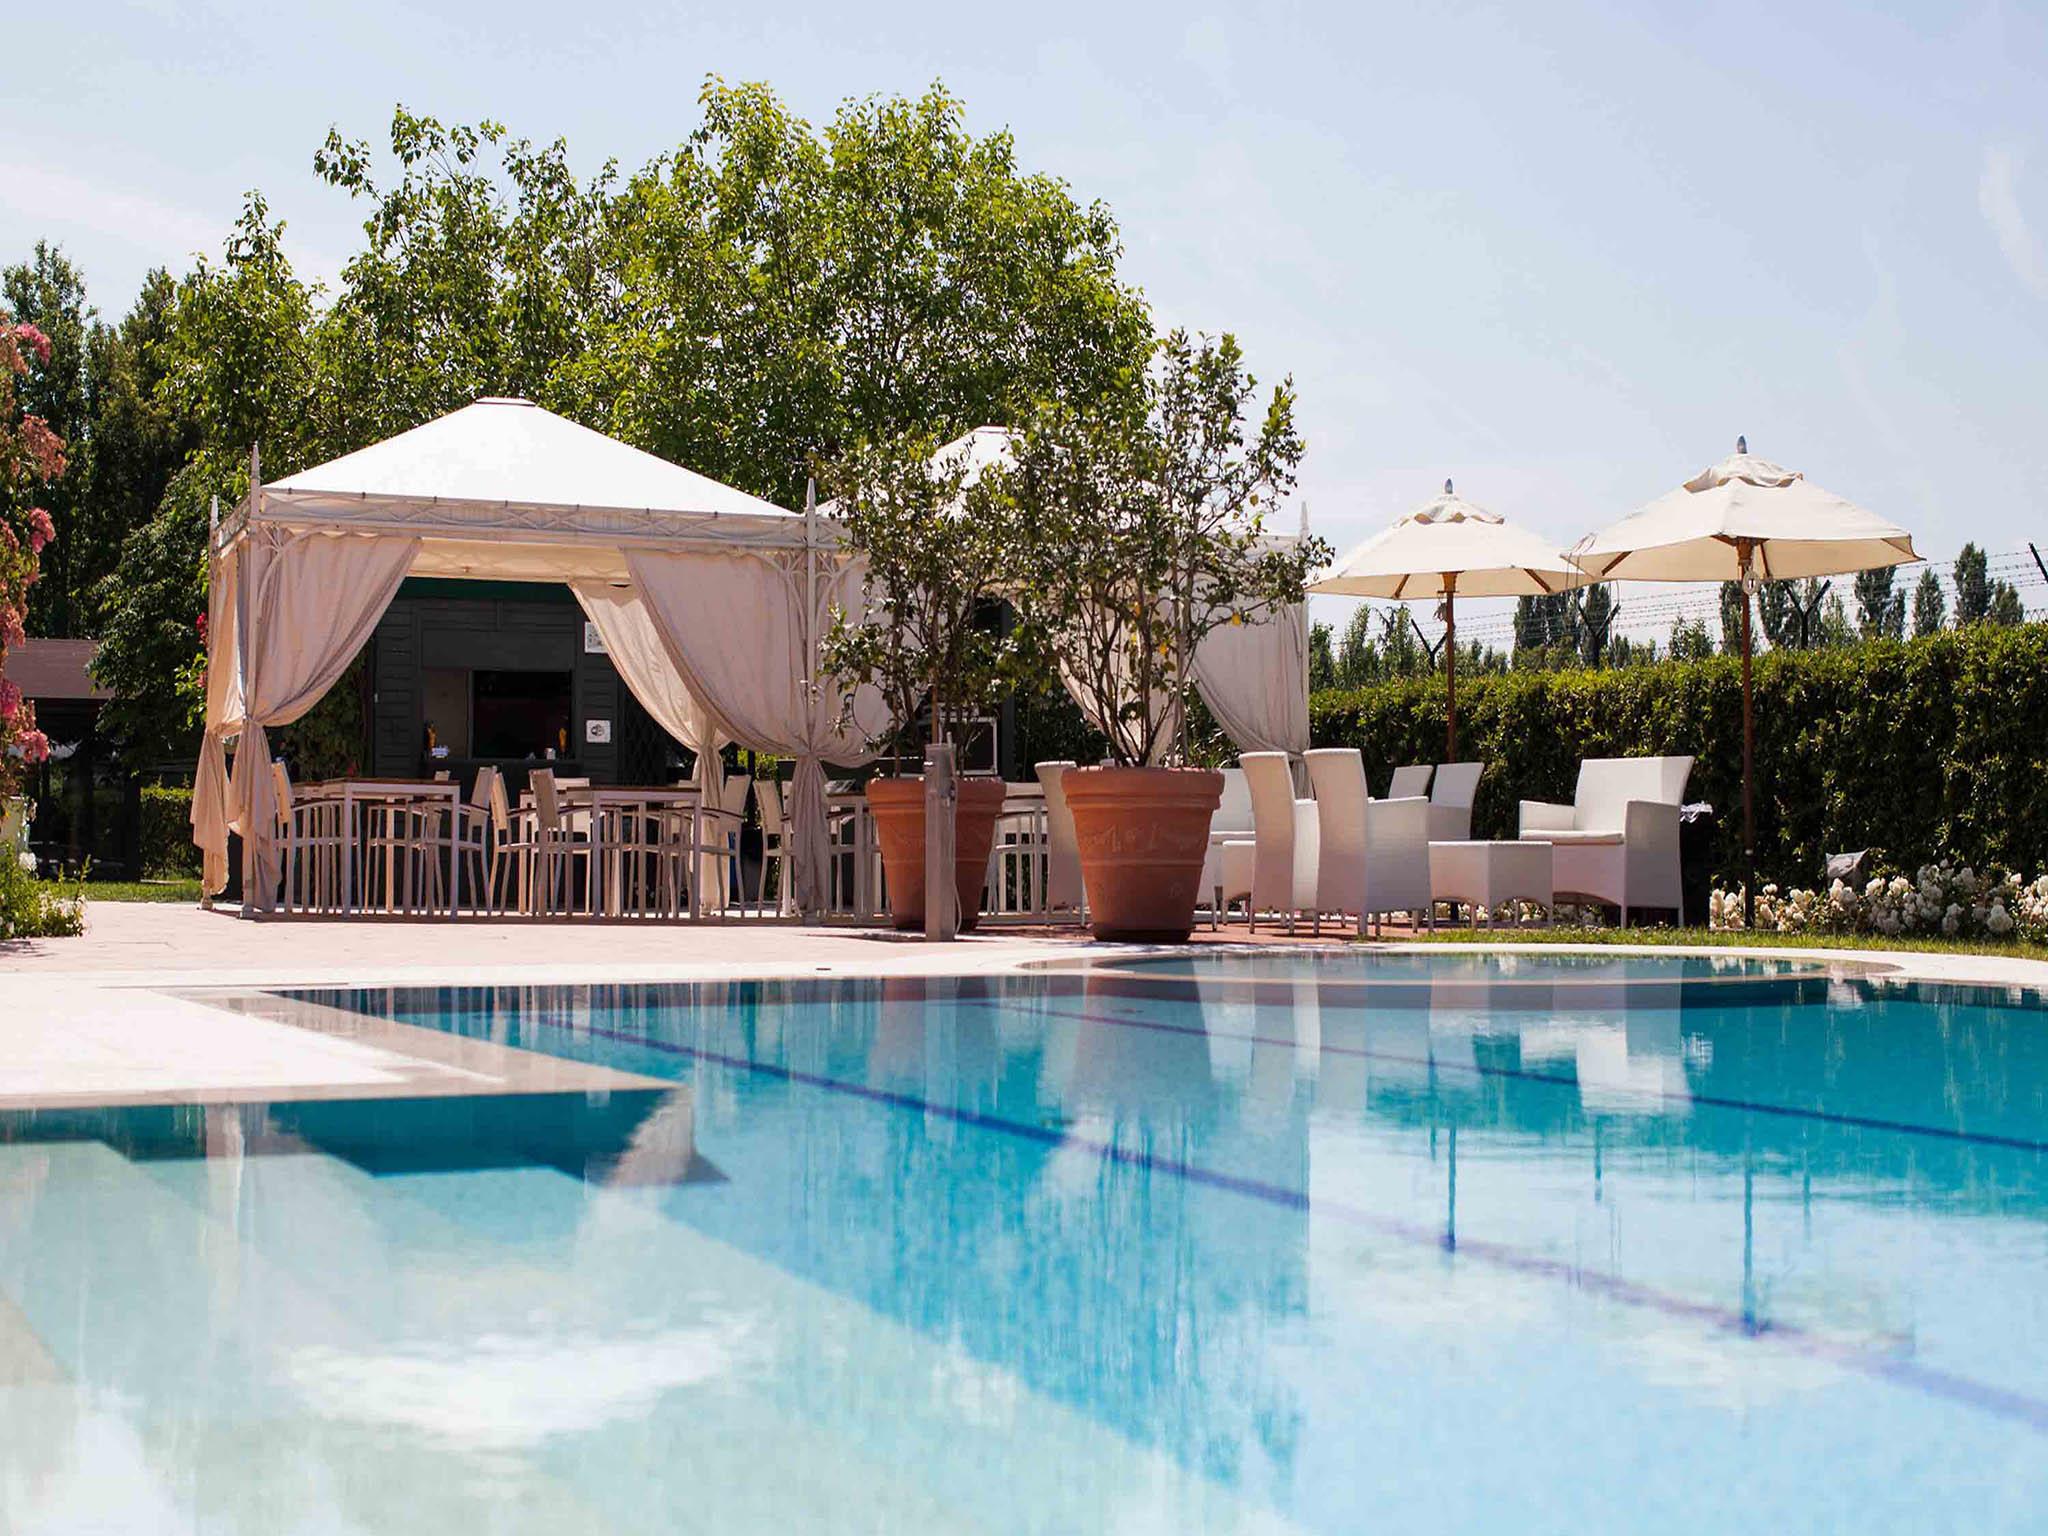 Hotel a FAENZA - Relais Villa Abbondanzi